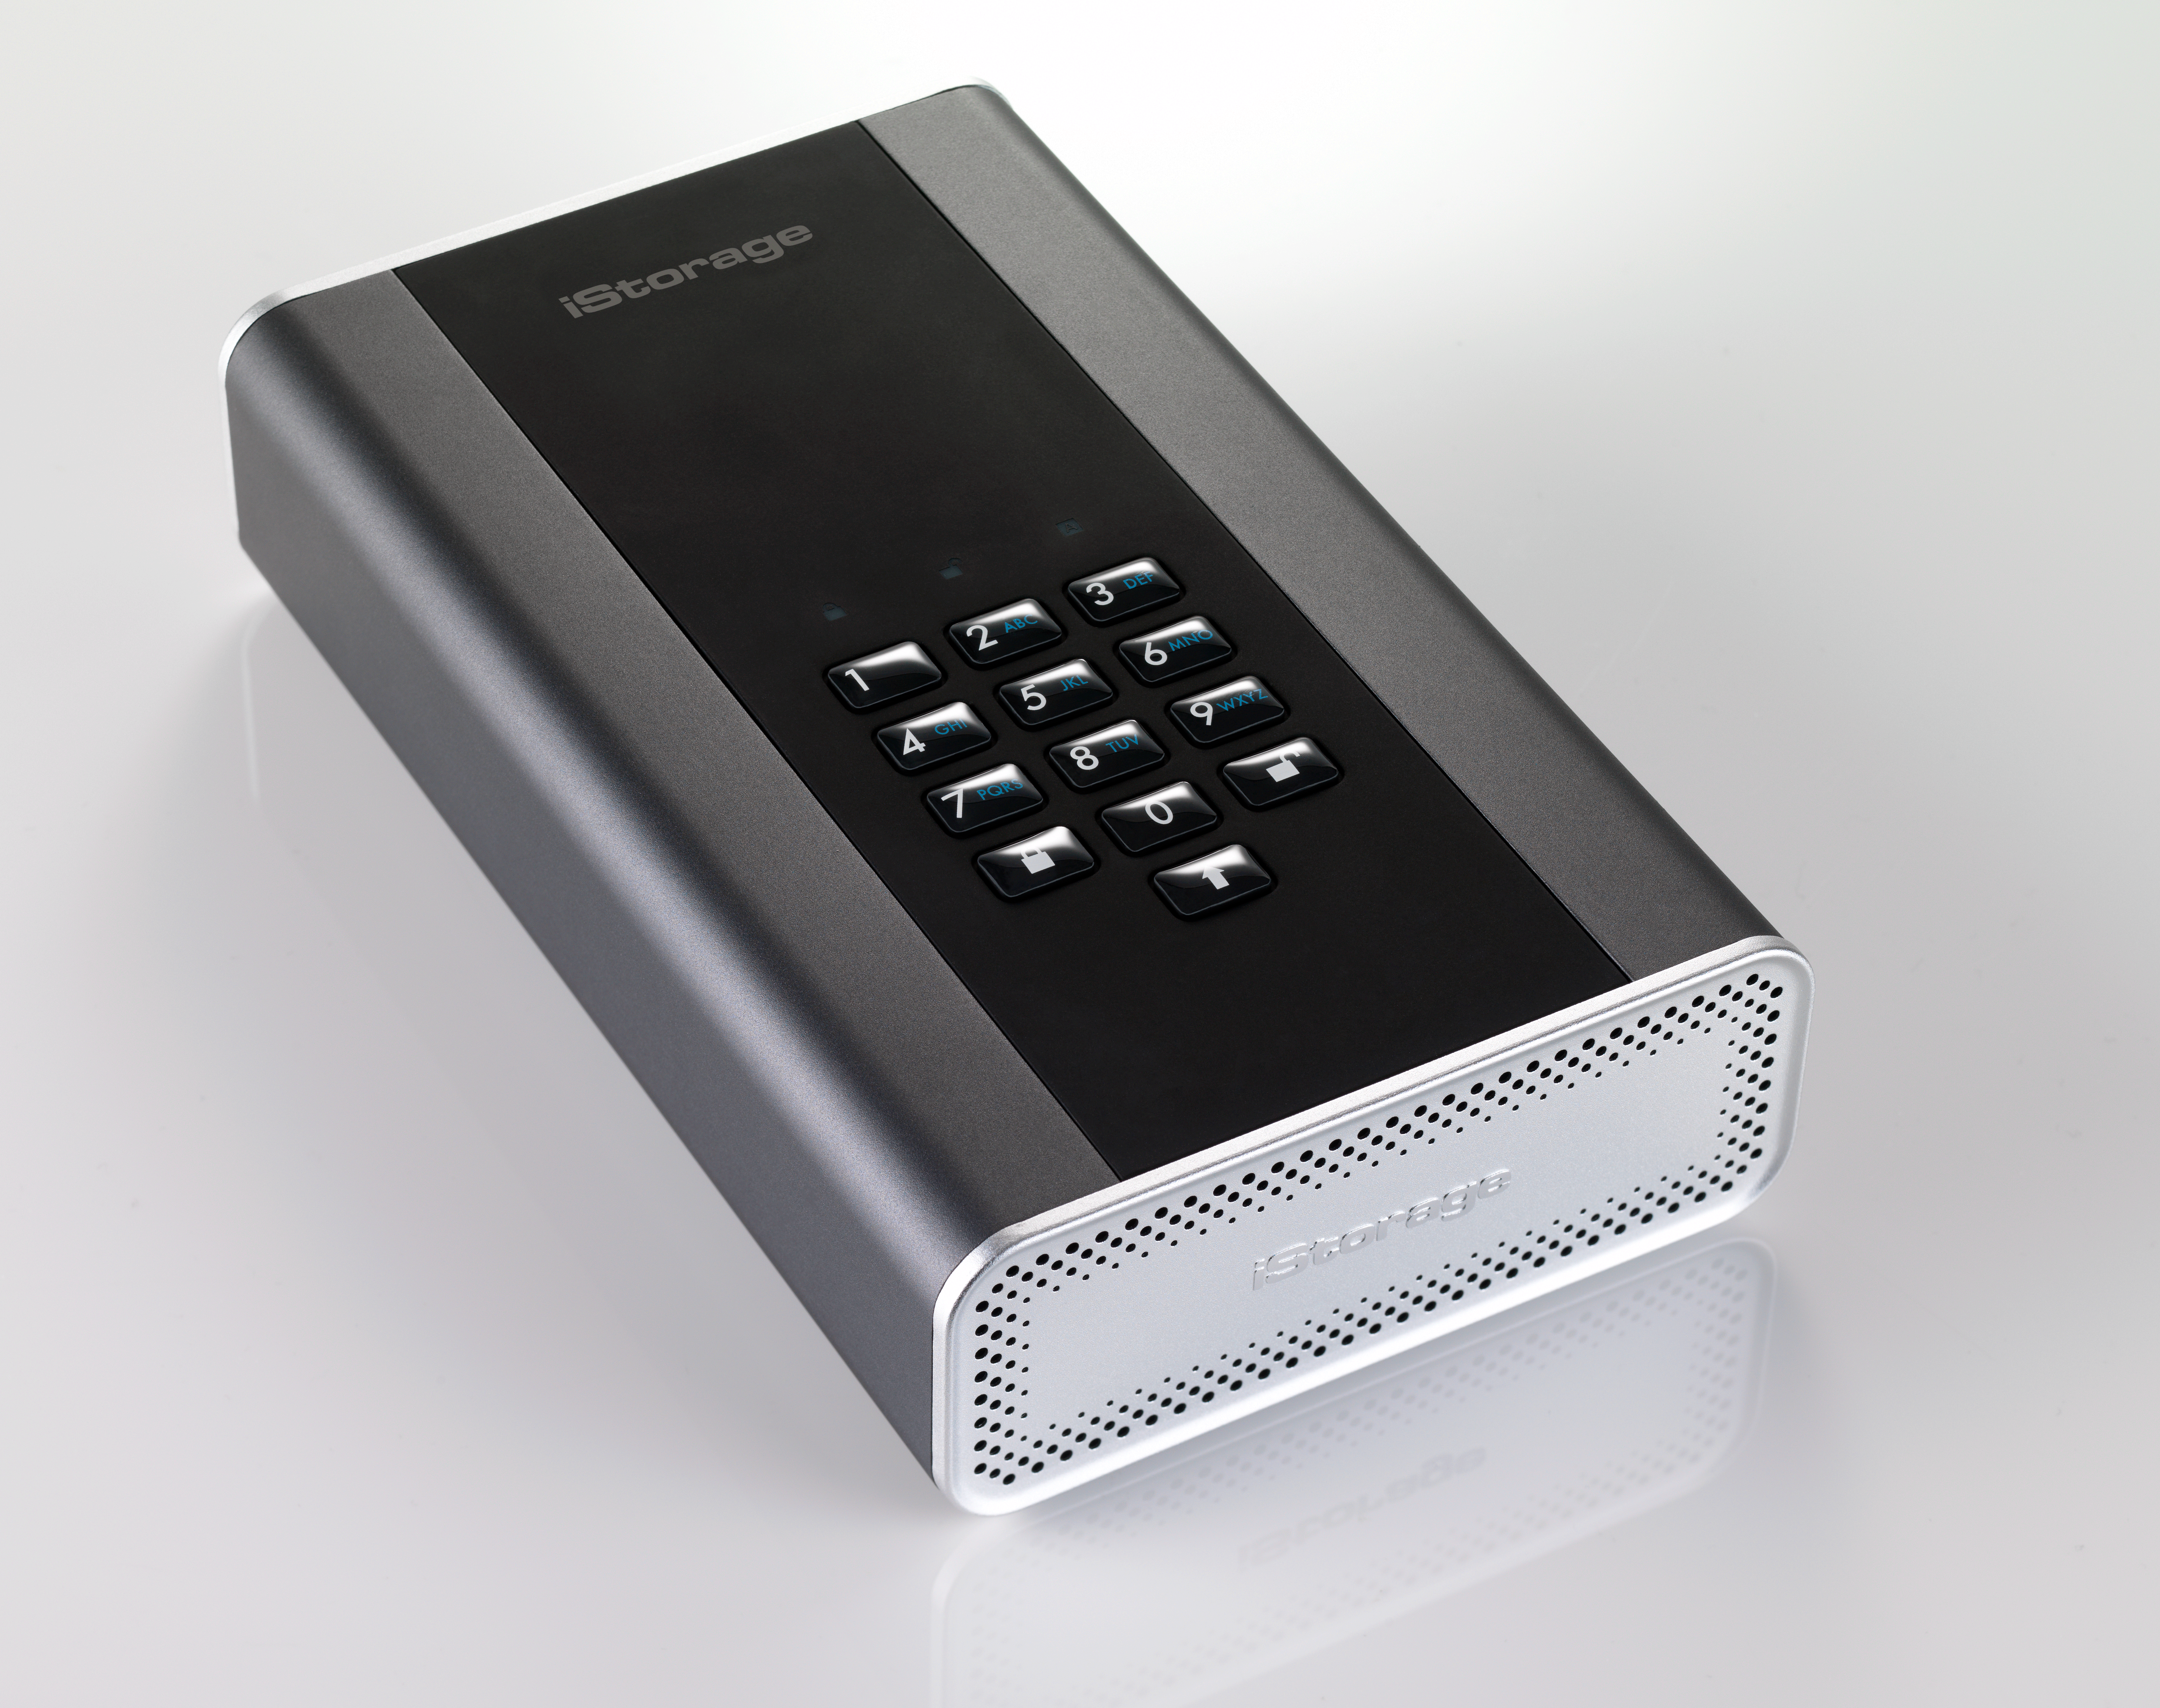 diskAshur DT² - Angle (2)